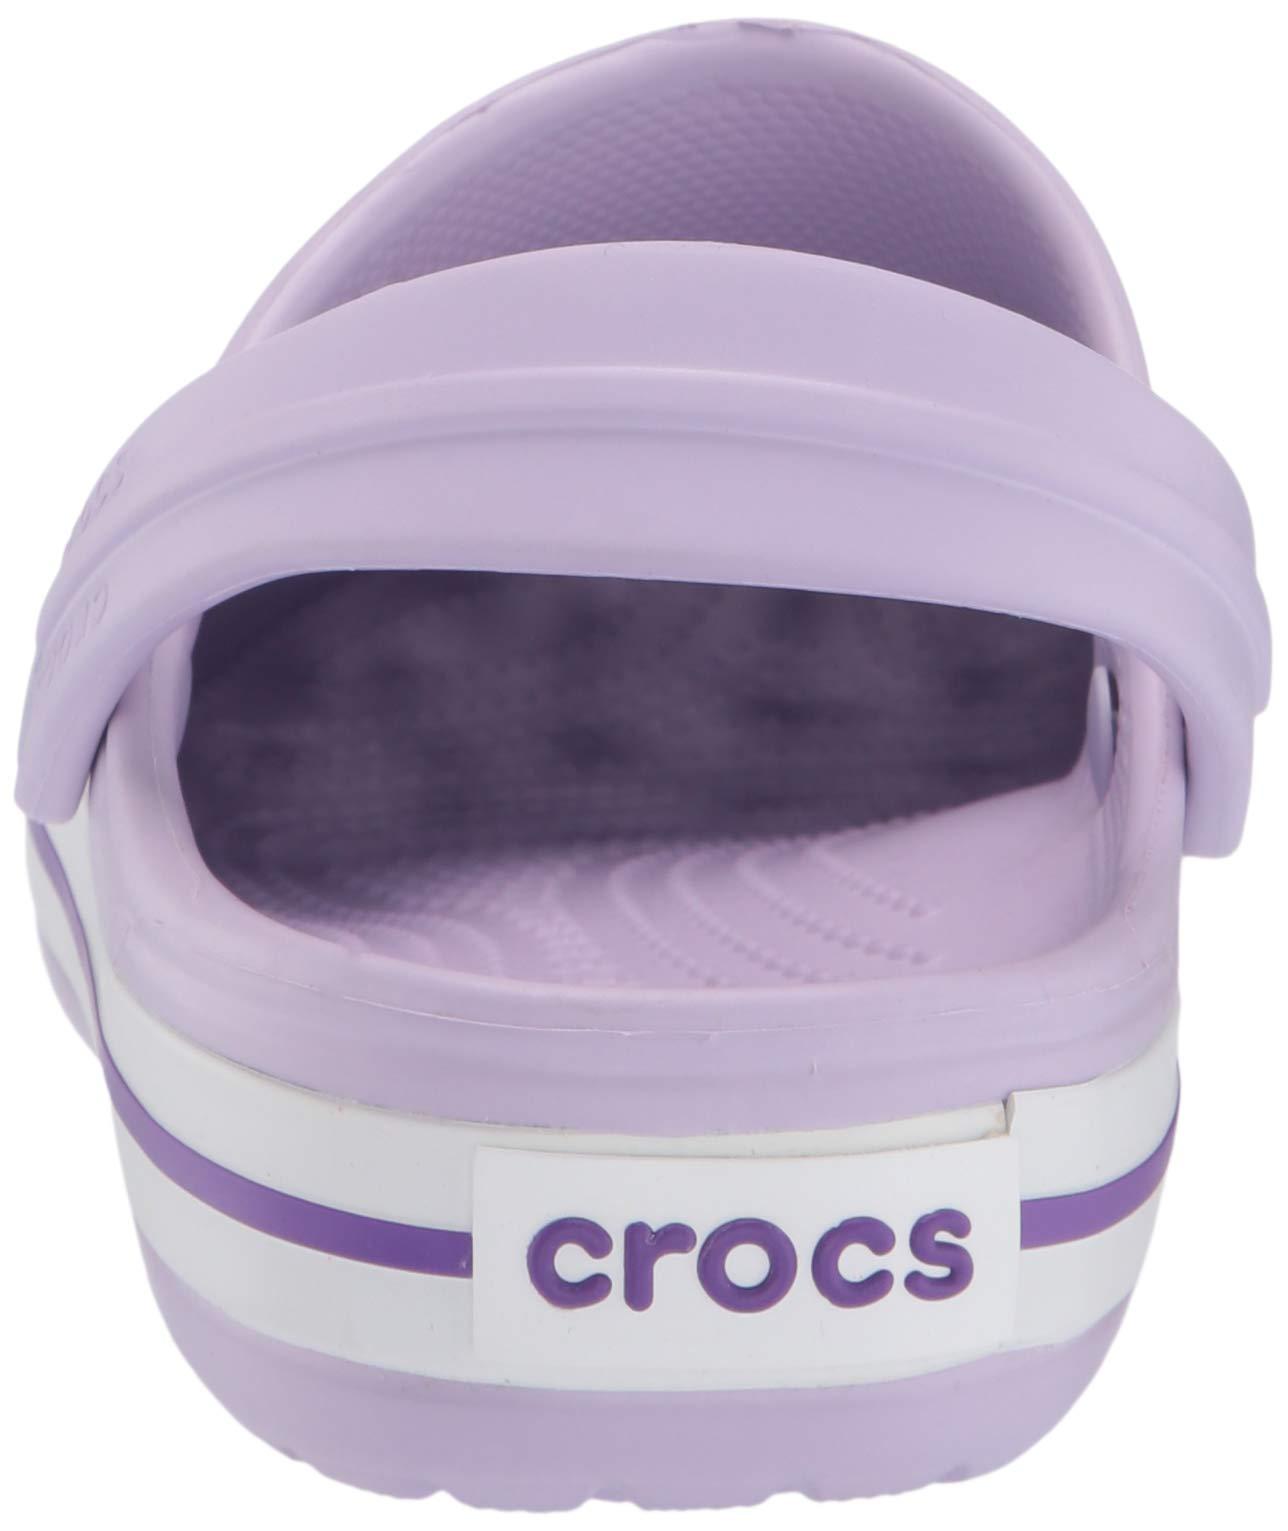 Crocs Kids' Crocband Clog, Lavender/Neon Purple, 10 M US Toddler by Crocs (Image #2)